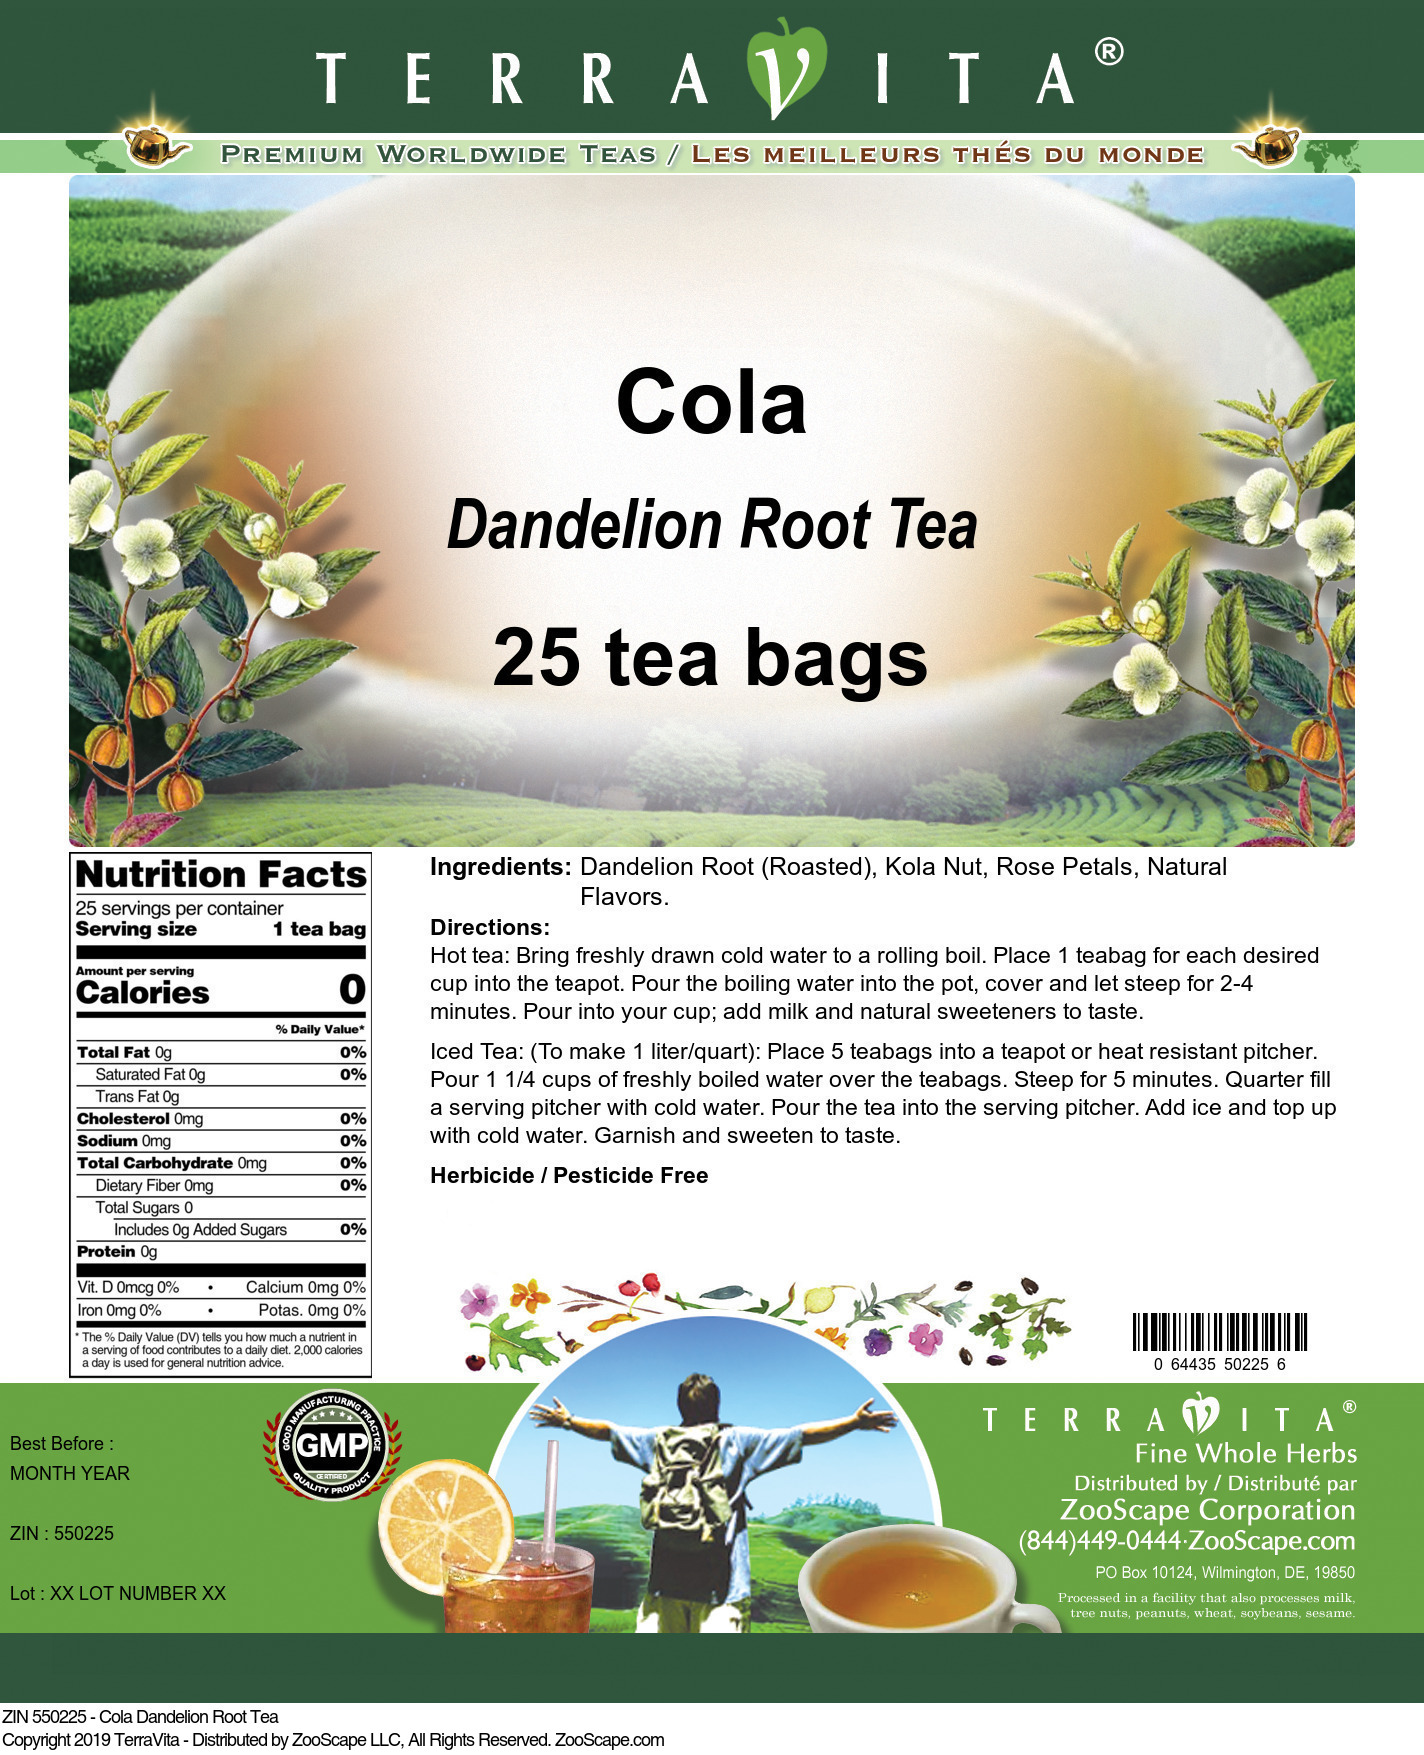 Cola Dandelion Root